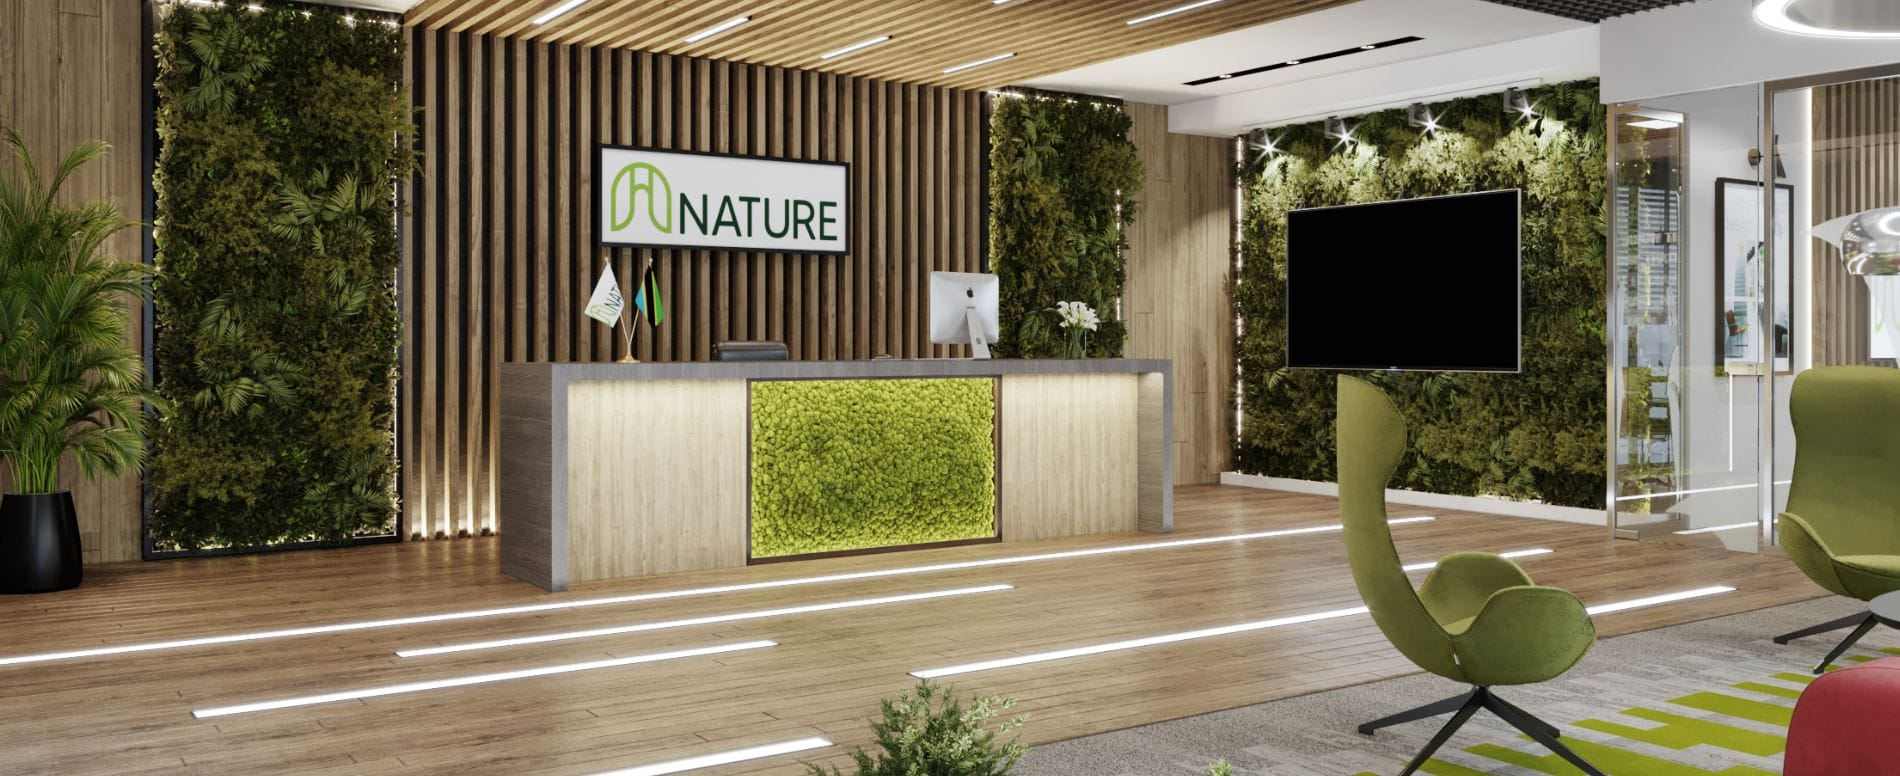 nature office design dar es salaam